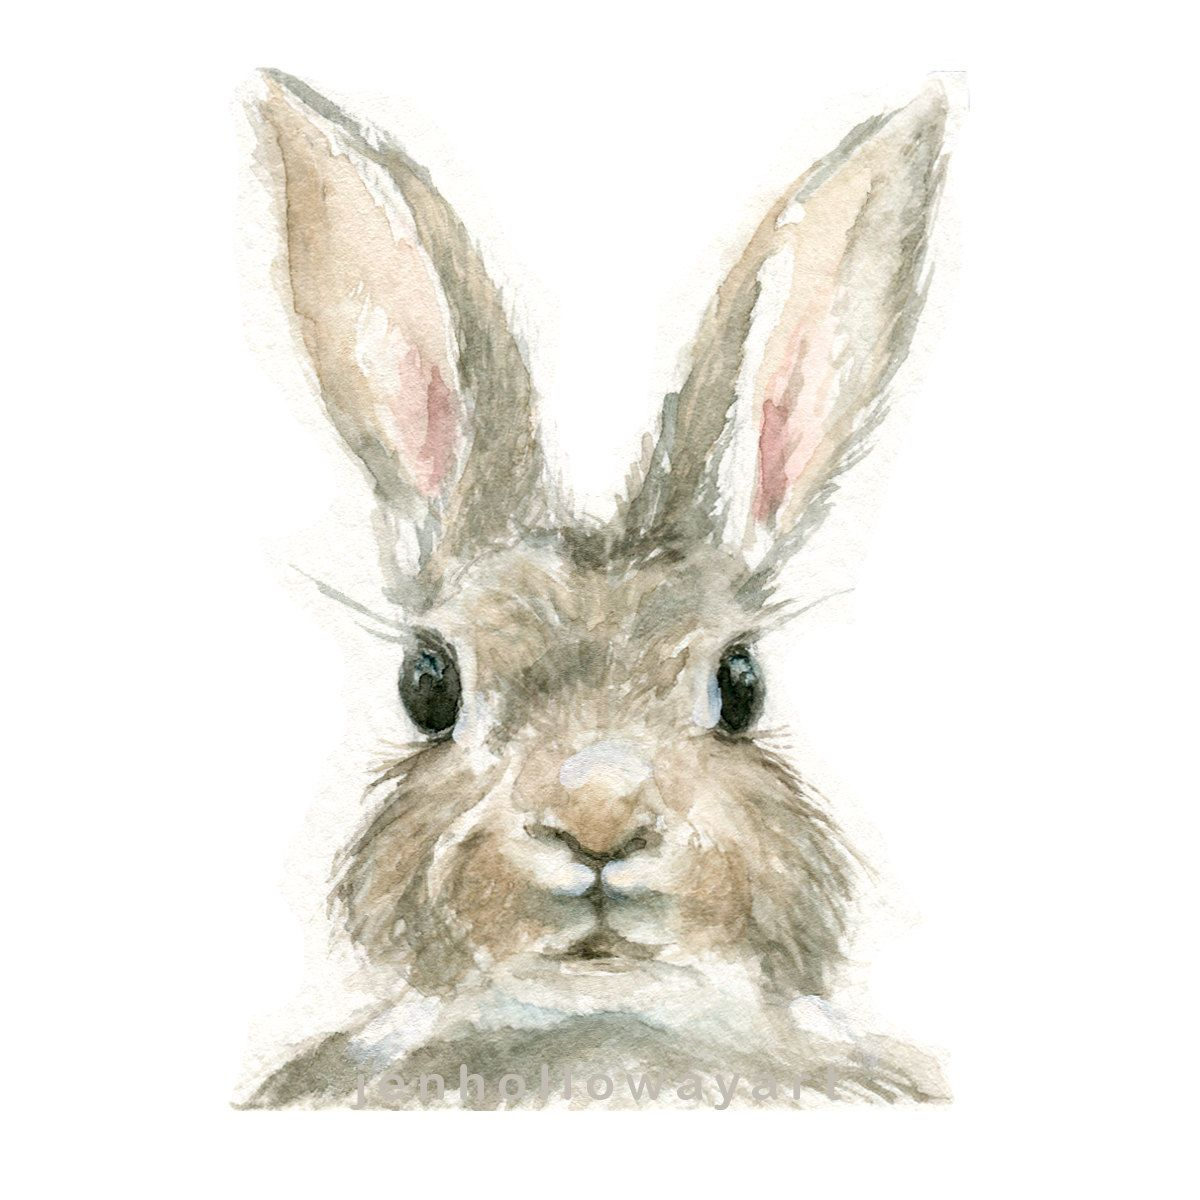 Aquarelle Lapin Lapin Print Impression Bunny Imprime Animal